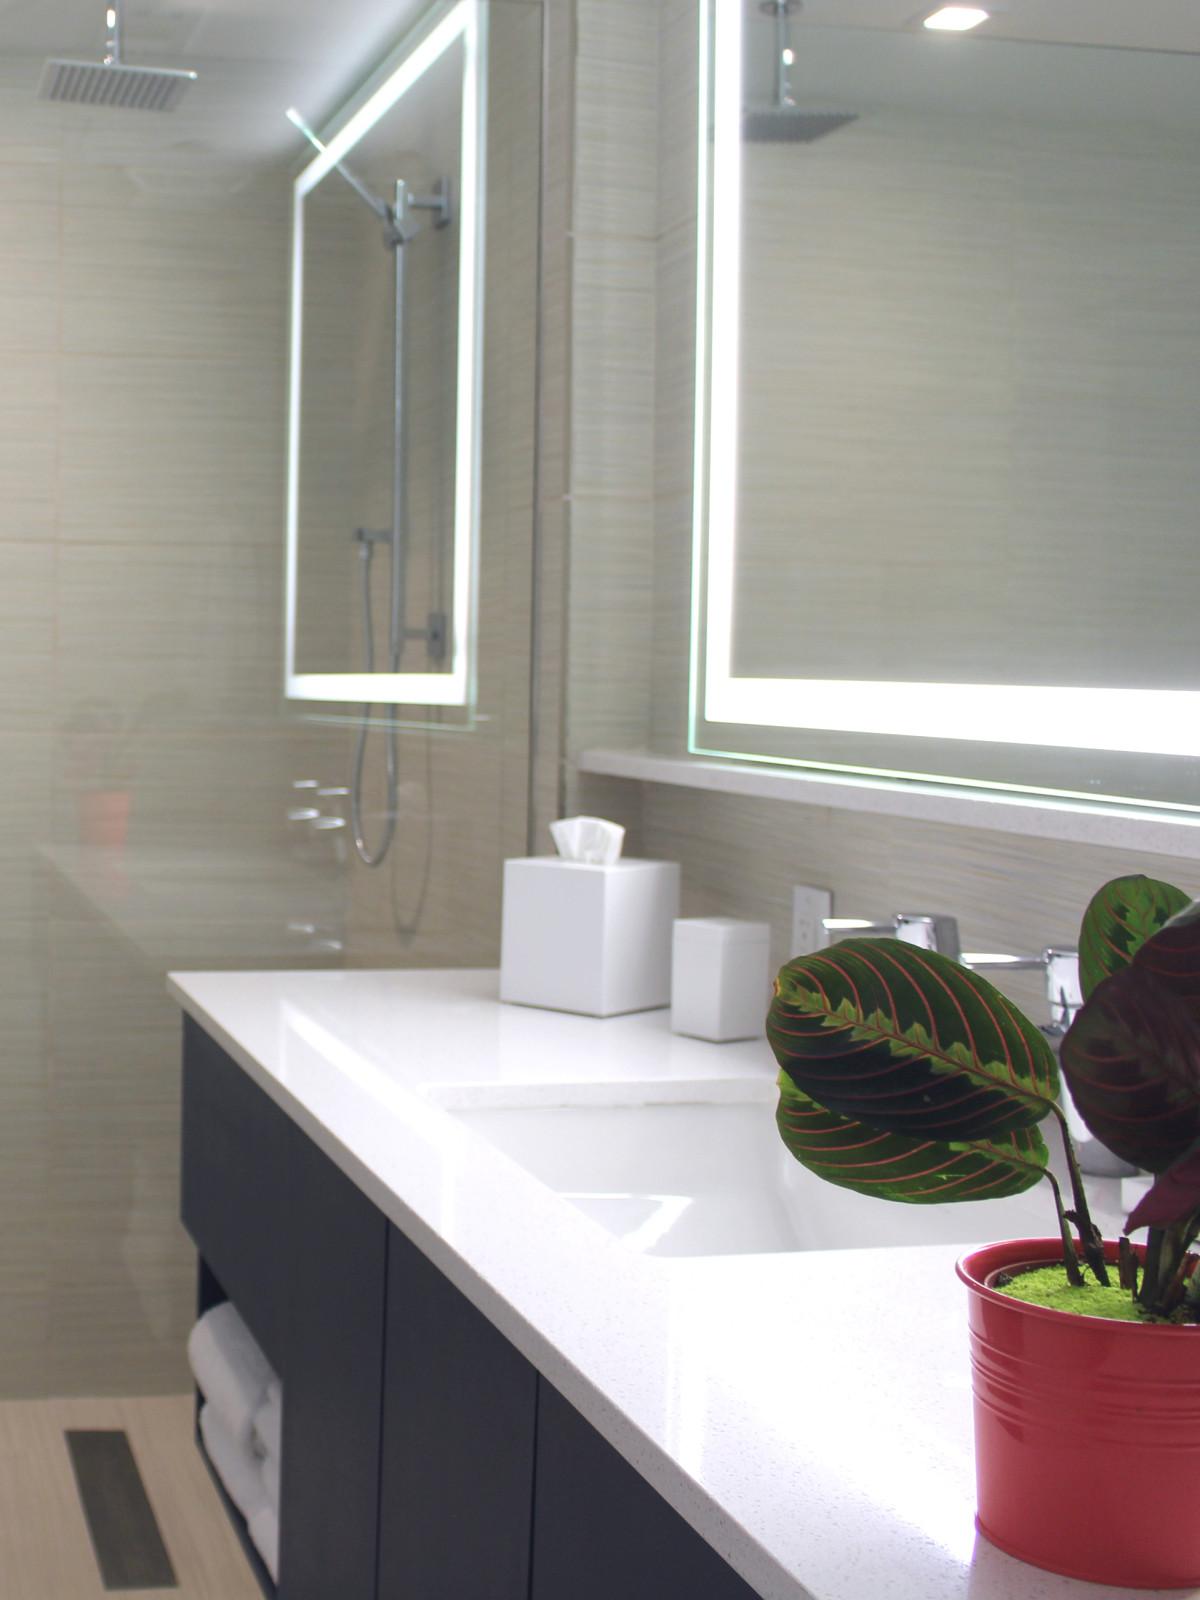 Hotel Eleven 11th Street Austin 2016 guest bedroom bathroom